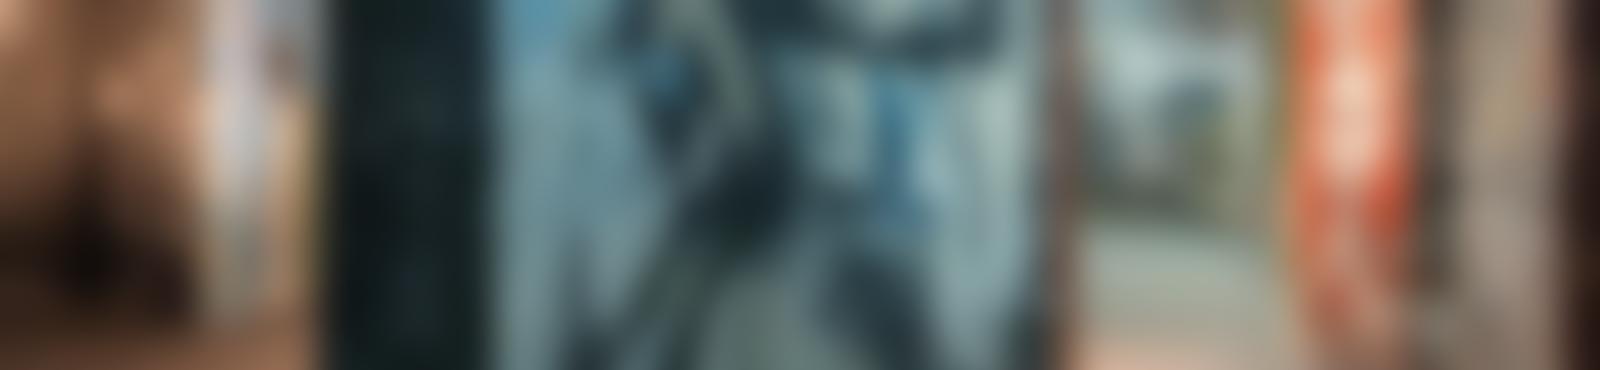 Blurred 6410821f 0691 4d1a 9d13 1049479829d5